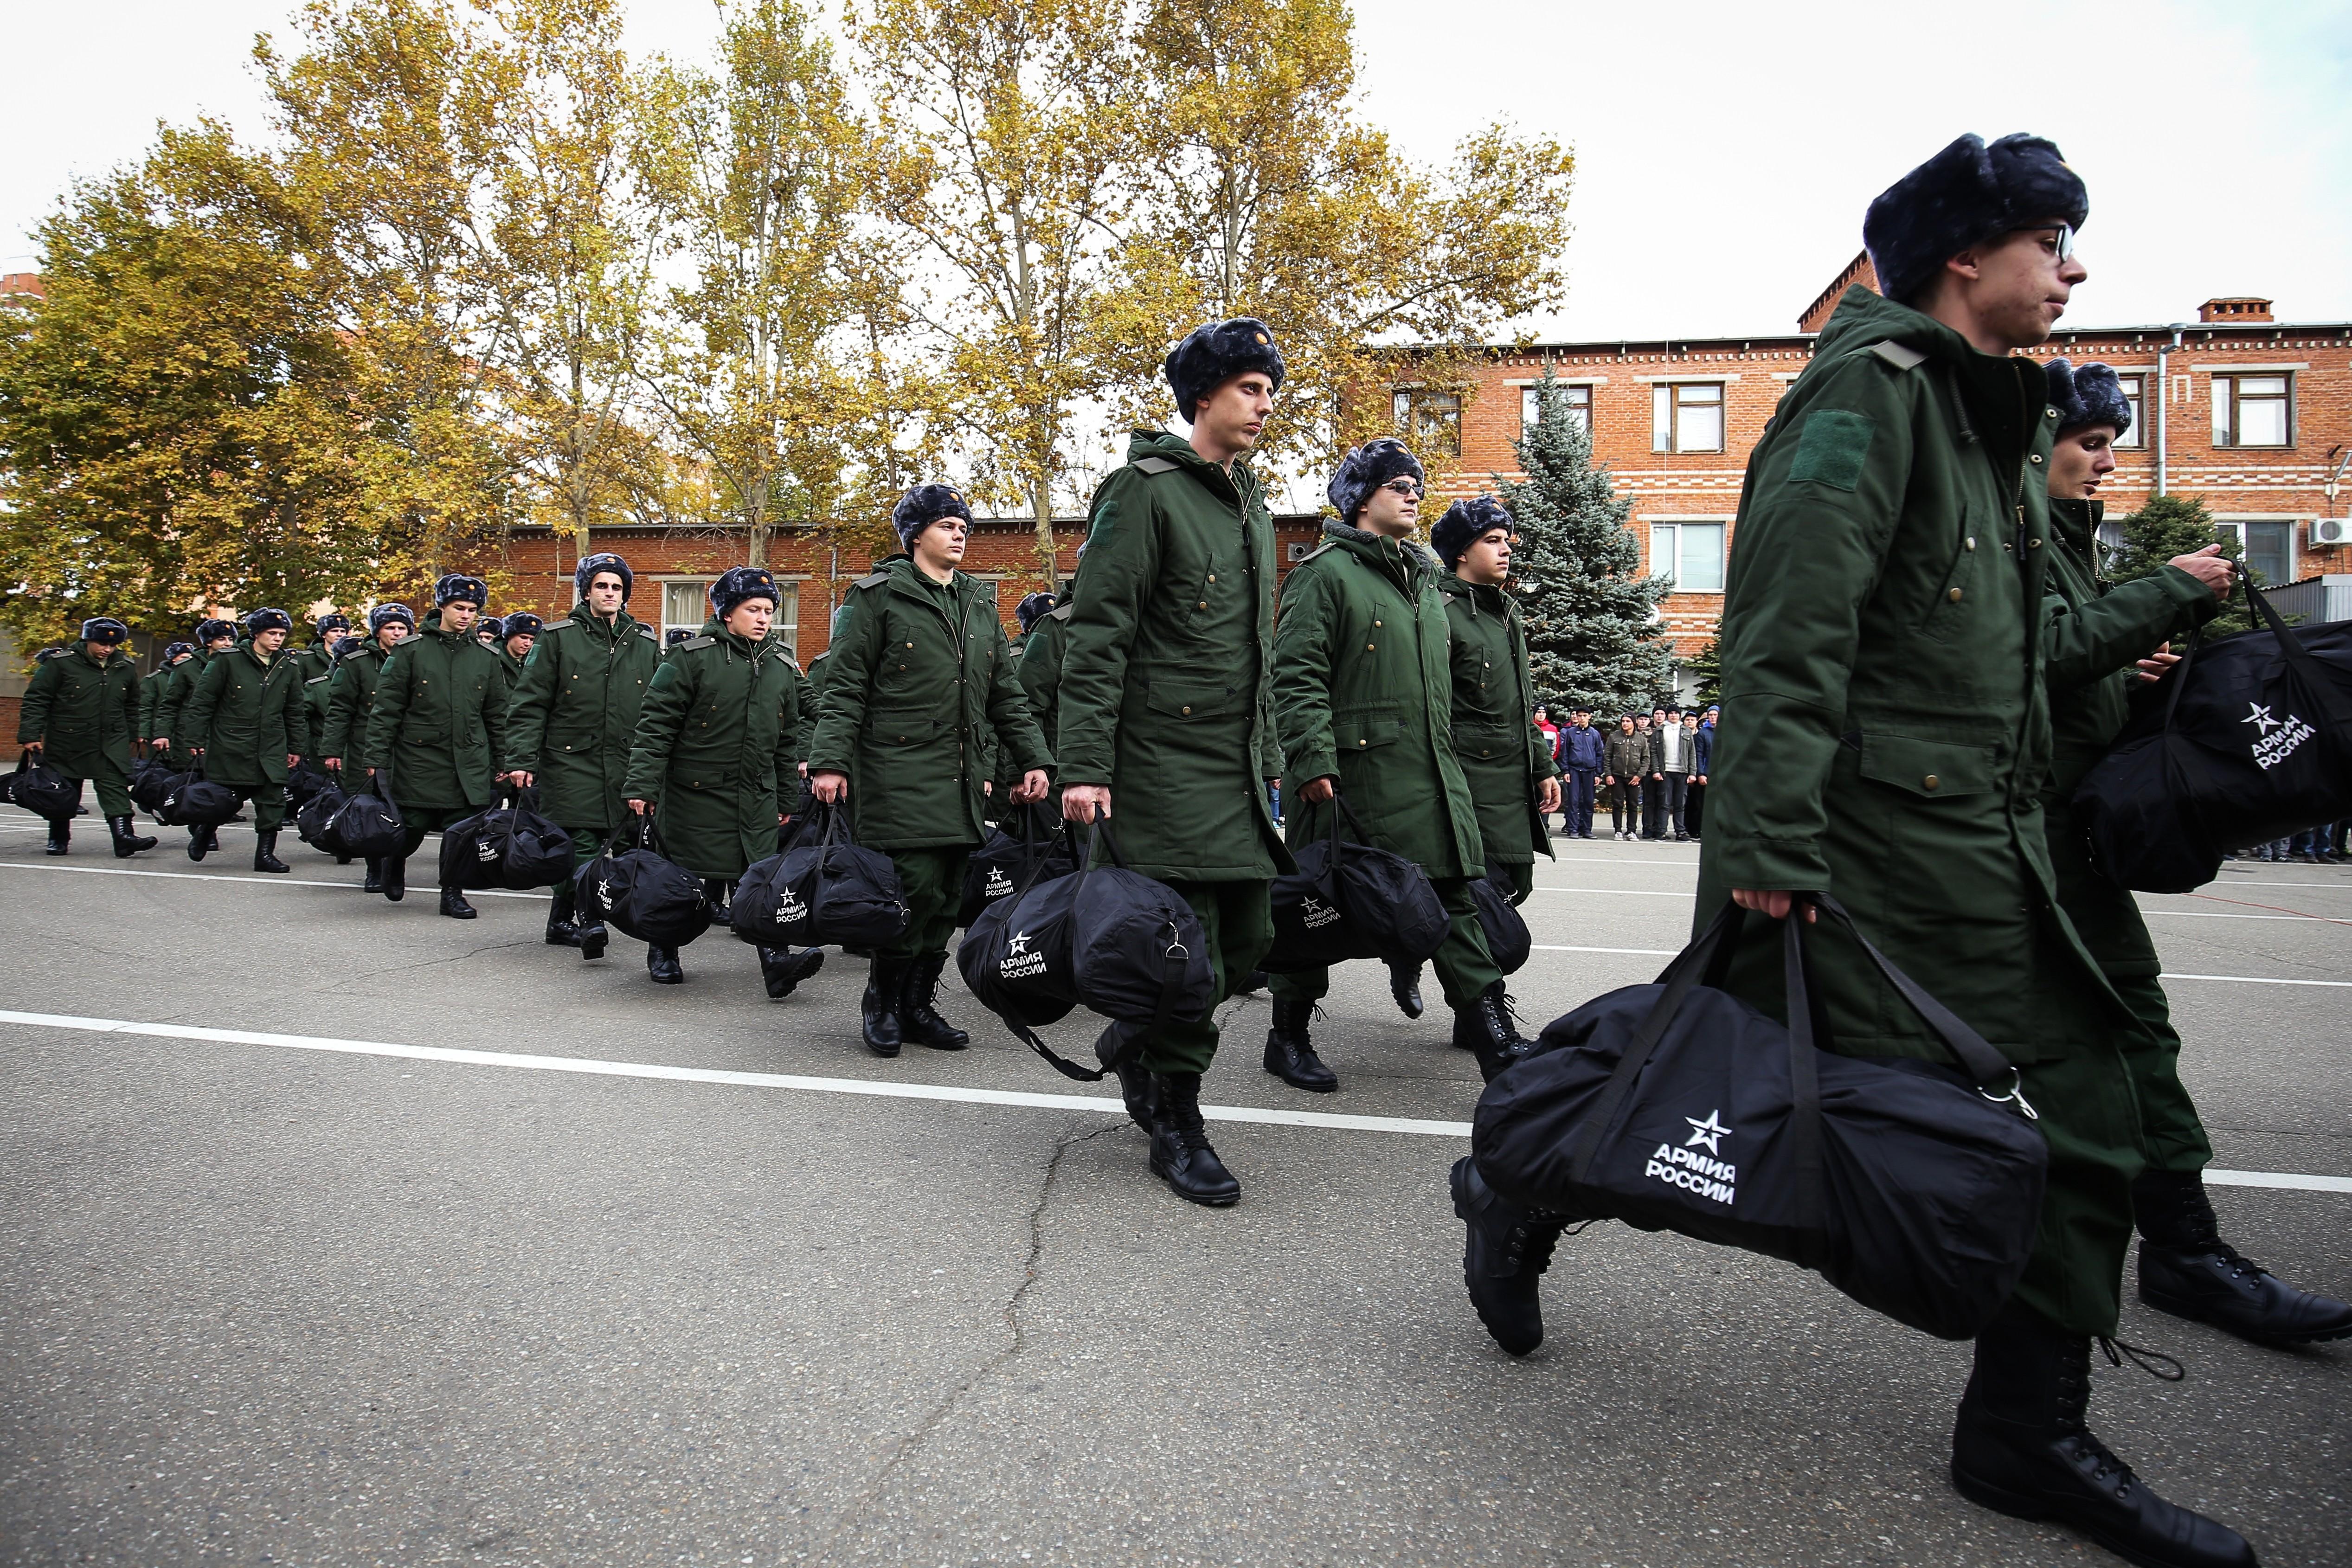 <p>Призывники на сборном пункте в Краснодаре. Фото: &copy;РИА Новости/Виталий Тимкив&nbsp;</p>